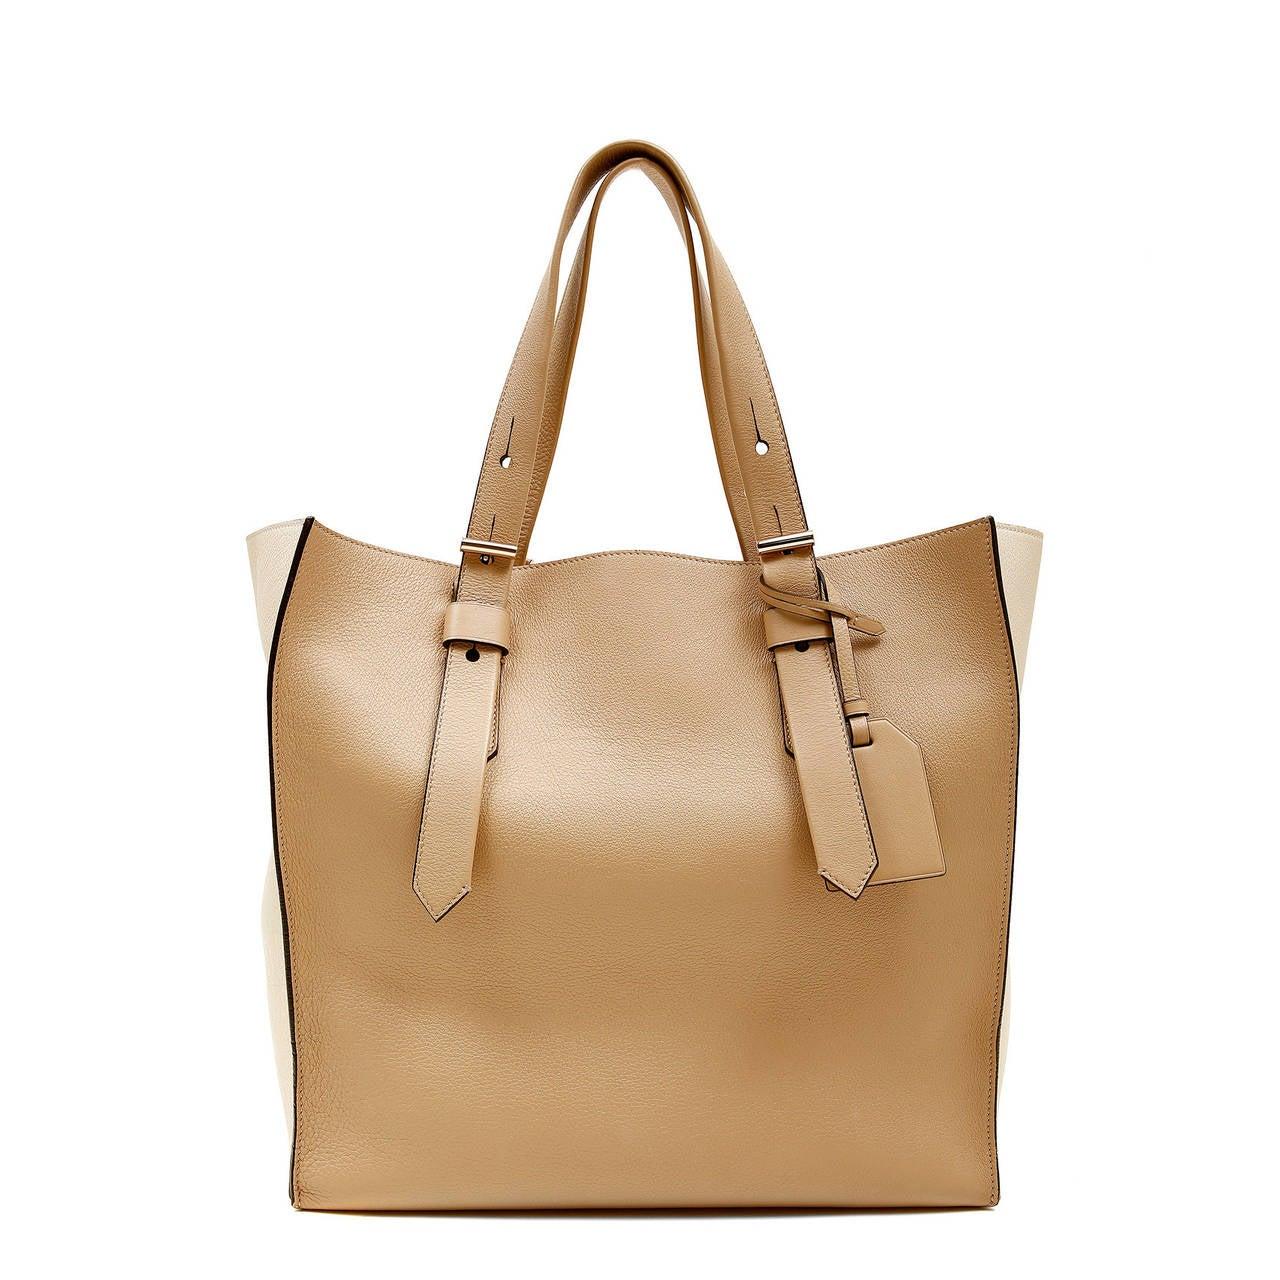 1stdibs 2000s Reed Krakoff Leather Bag EALQqyOQXt